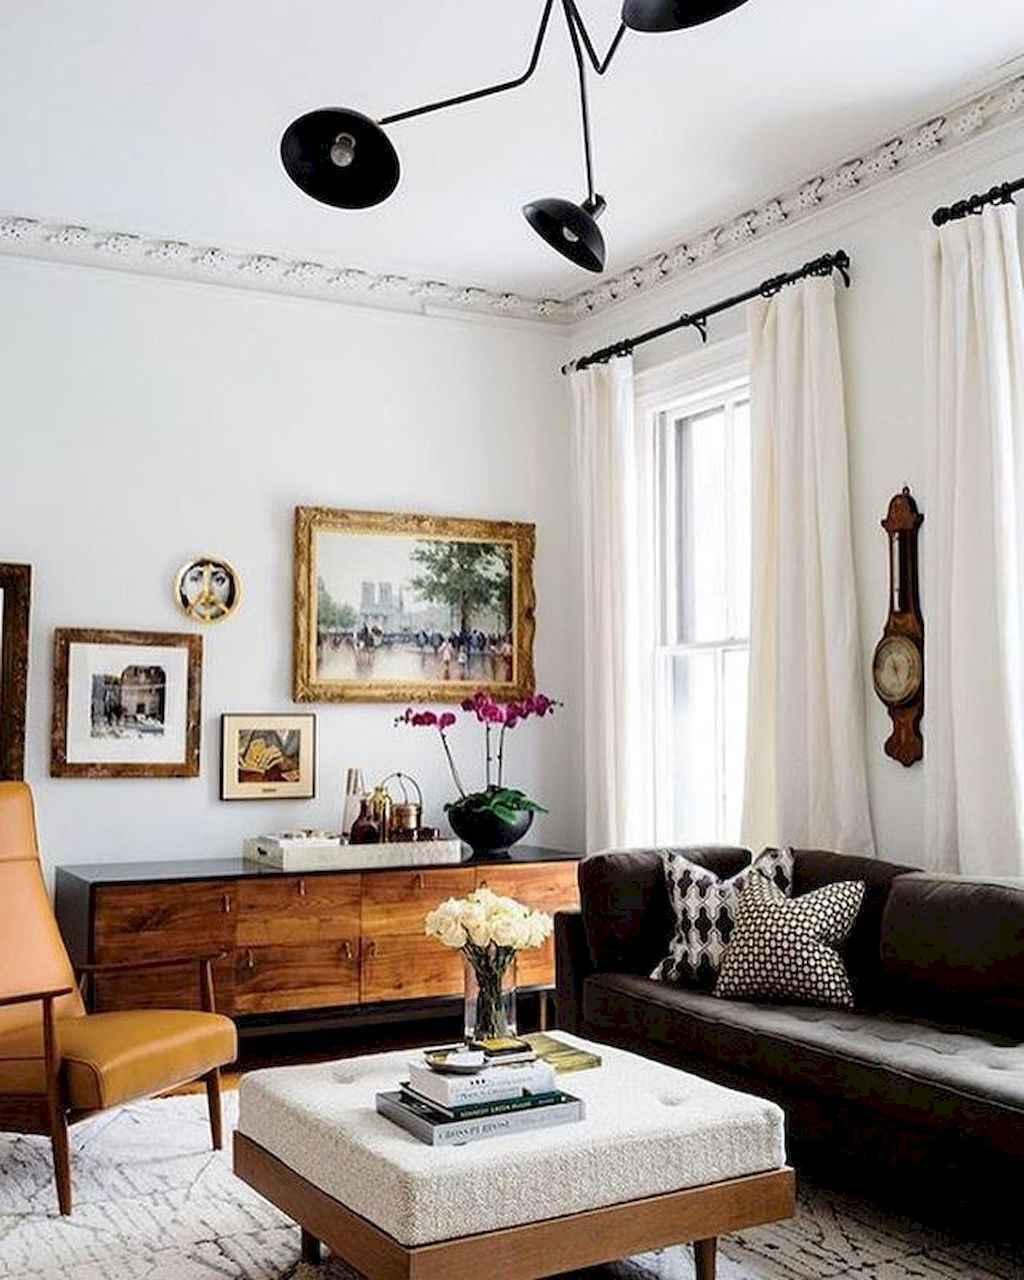 Simple clean vintage living room decorating ideas (24)